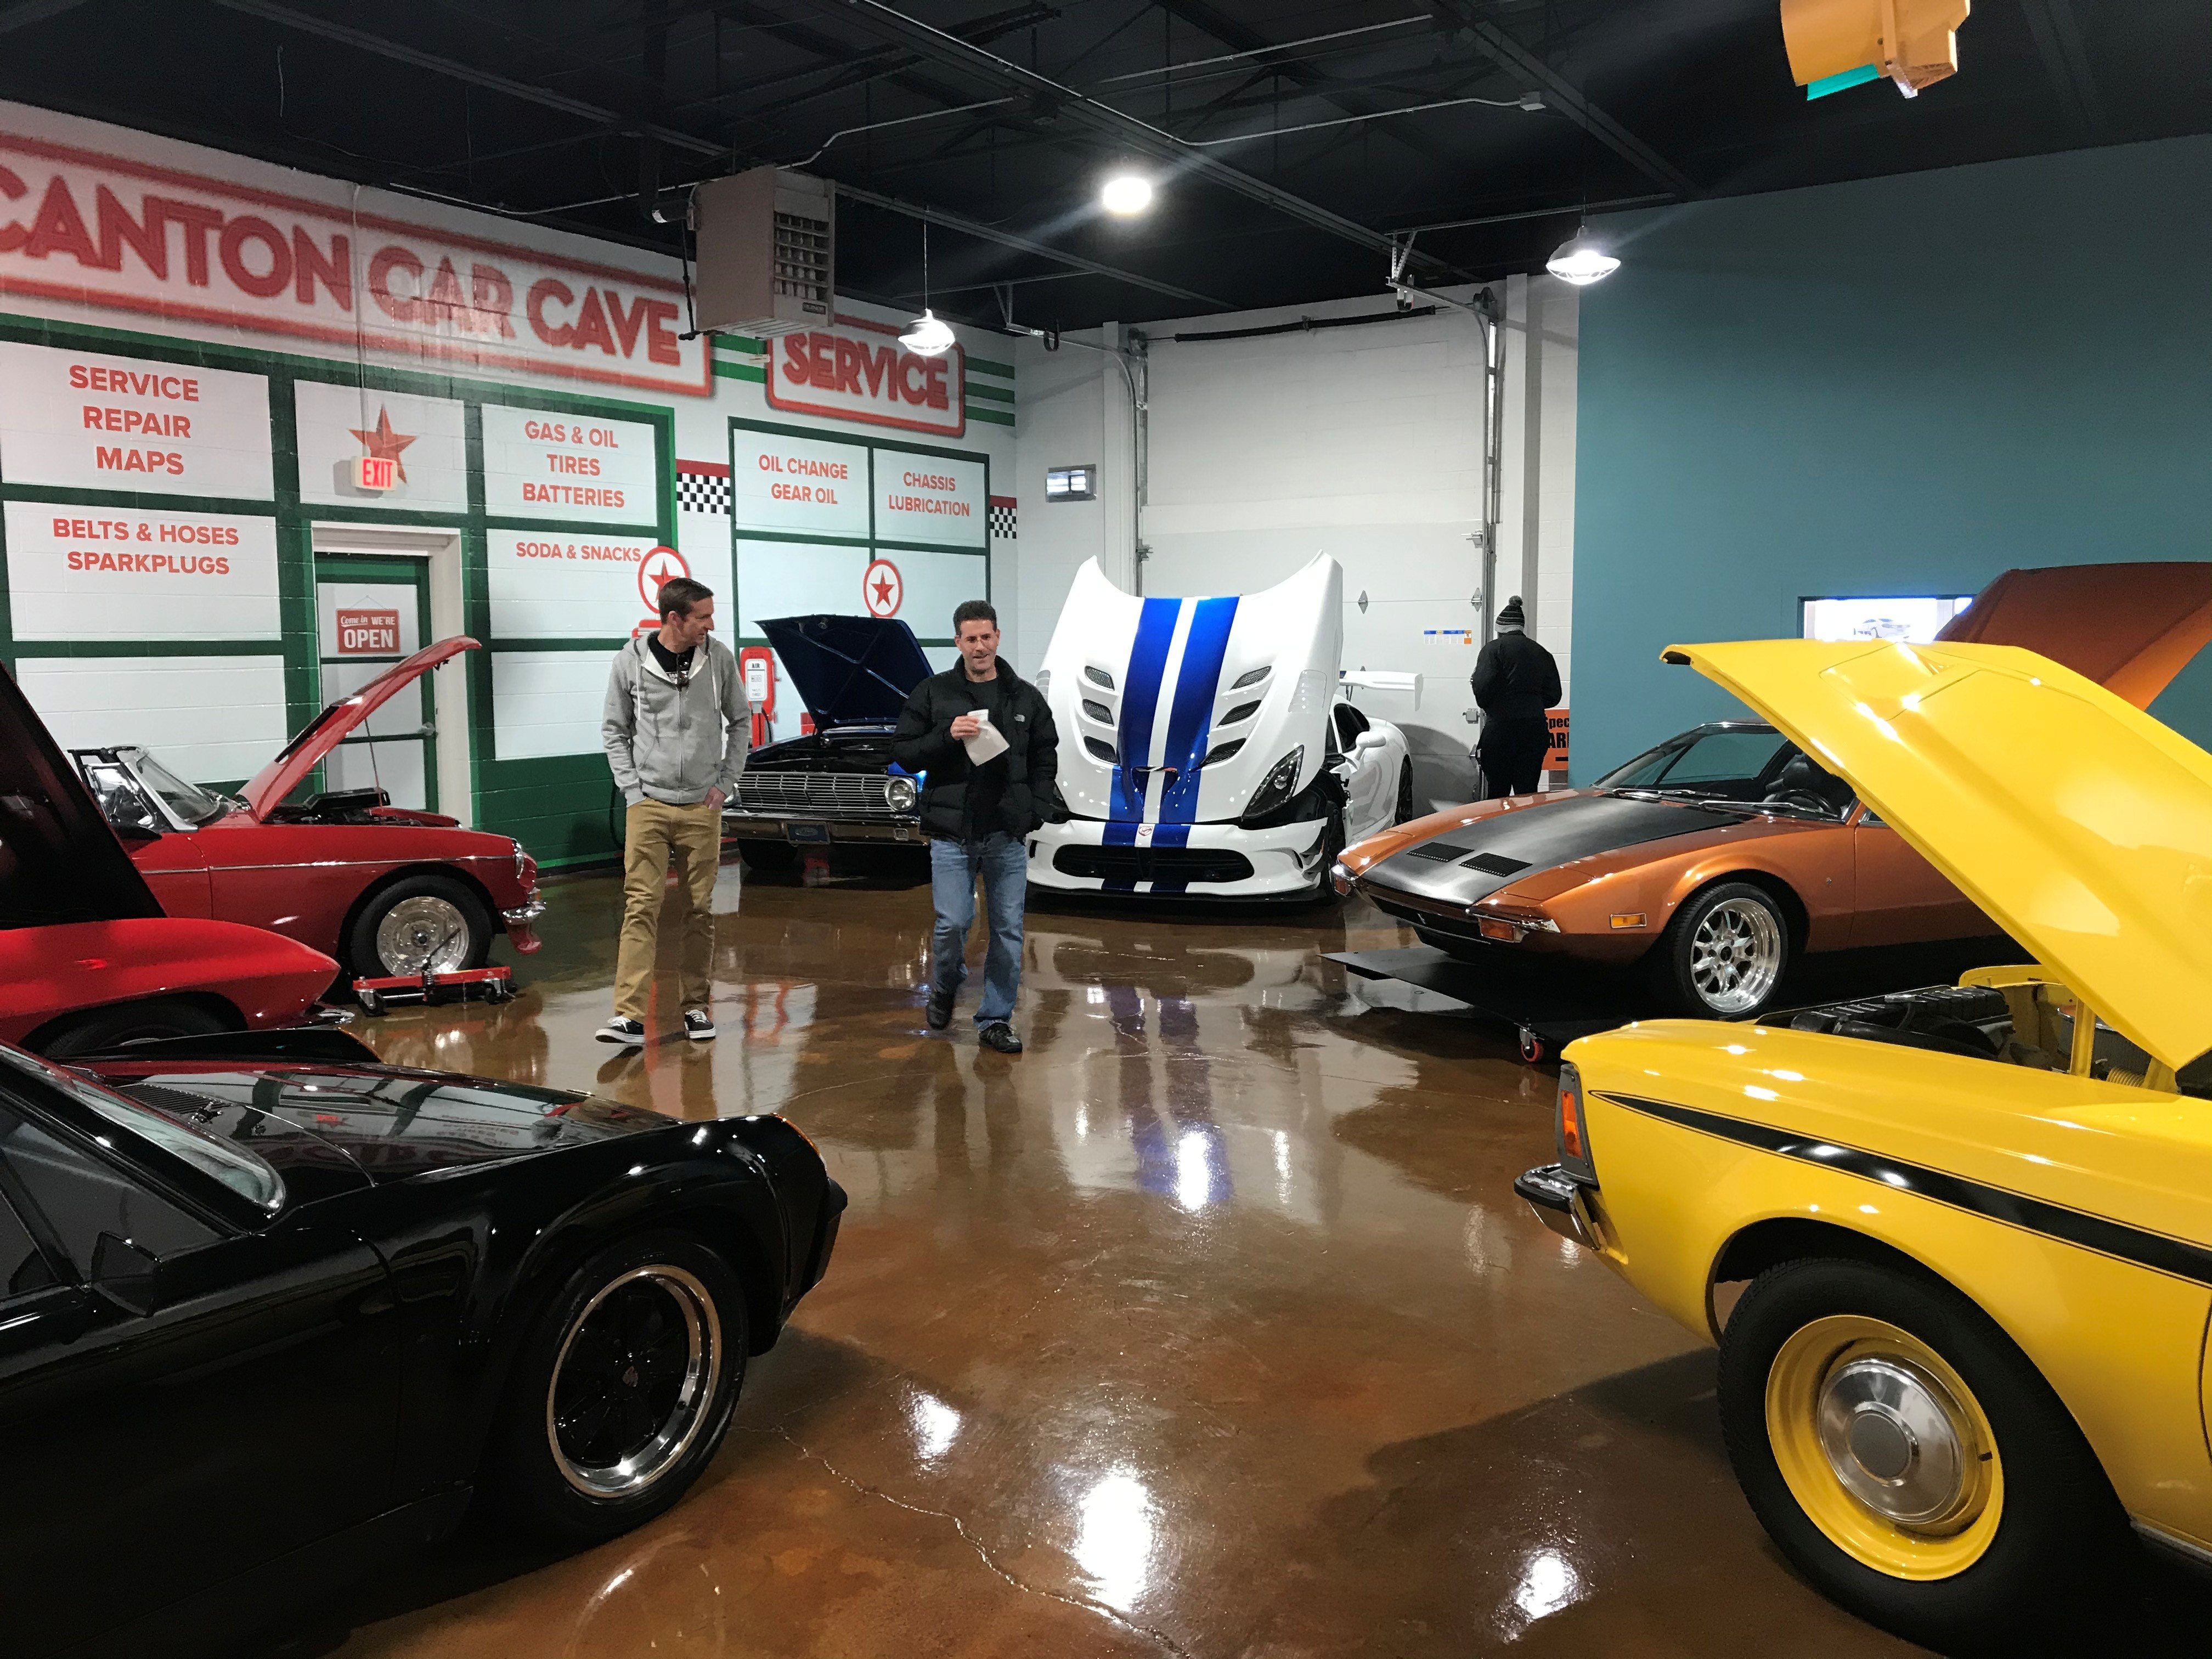 2020.02.15-27-Canton-Car-Cave-Cars-Coffee